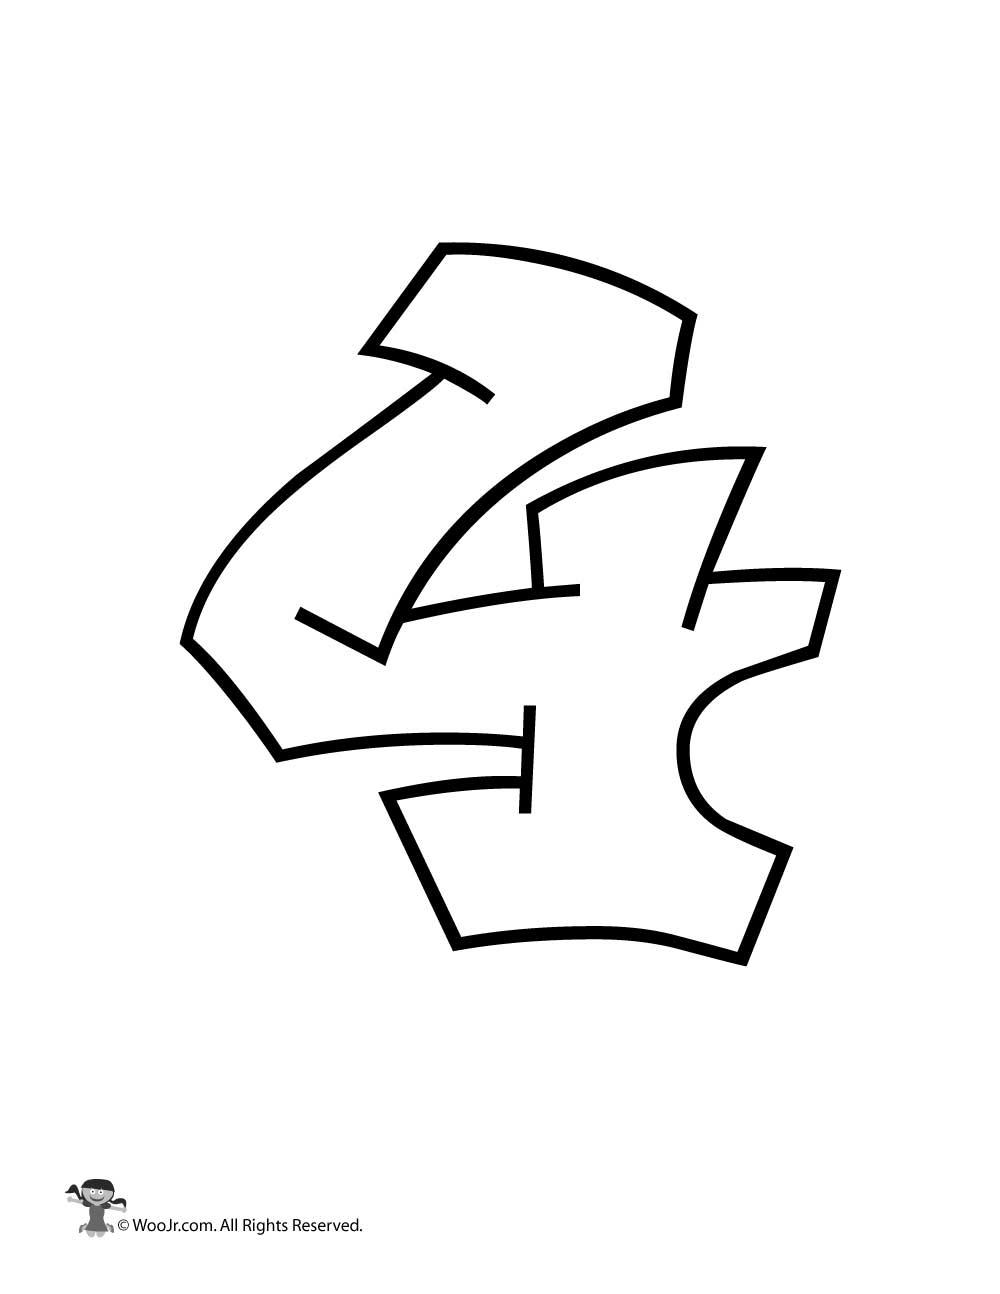 Bubble Graffiti Numbers : bubble, graffiti, numbers, Graffiti:, Graffiti, Bubble, Numbers